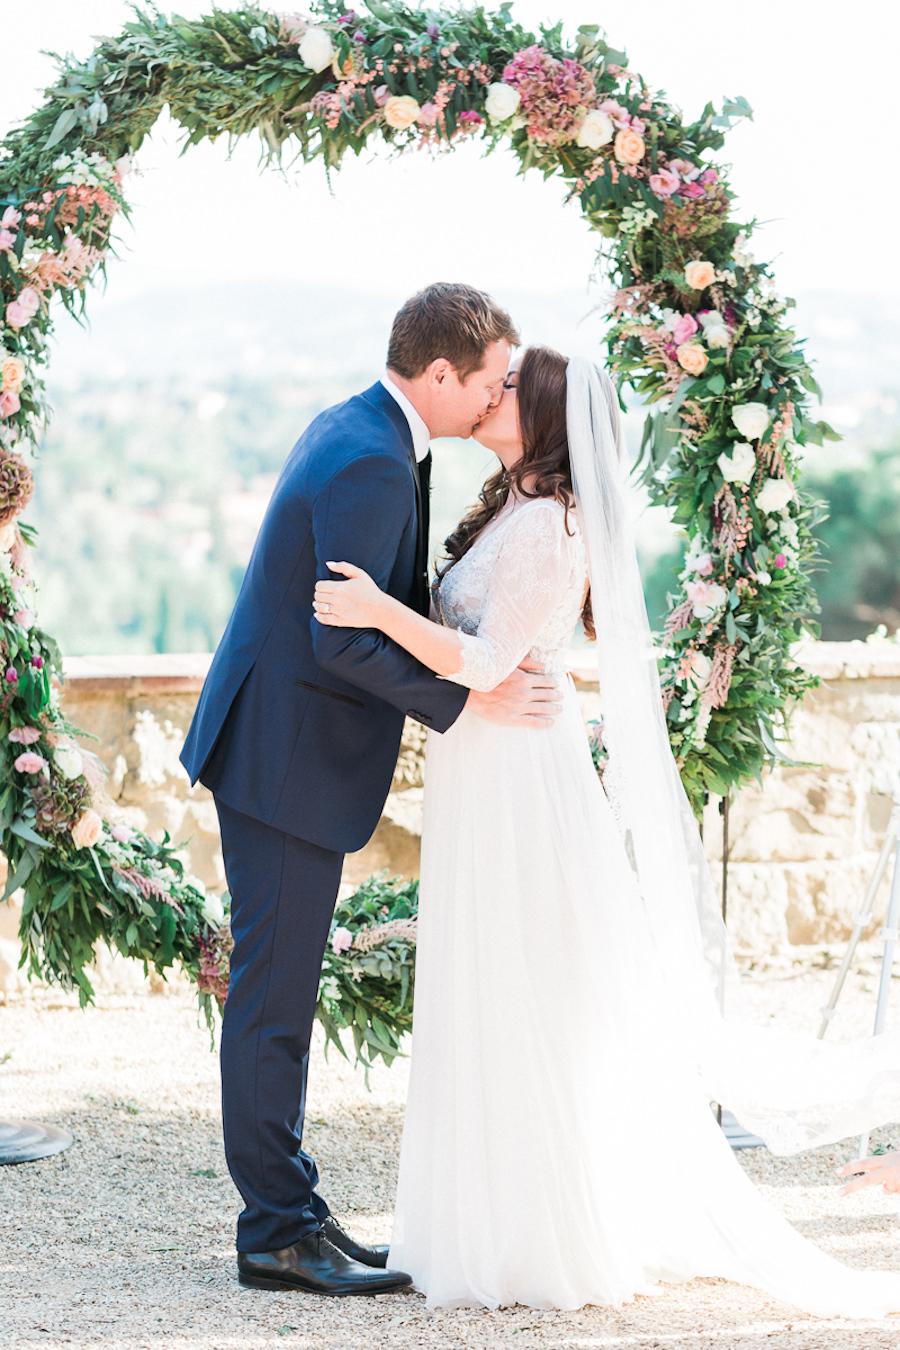 ceremony kiss - photo by Kylee Yee https://ruffledblog.com/romantic-al-fresco-wedding-in-tuscany